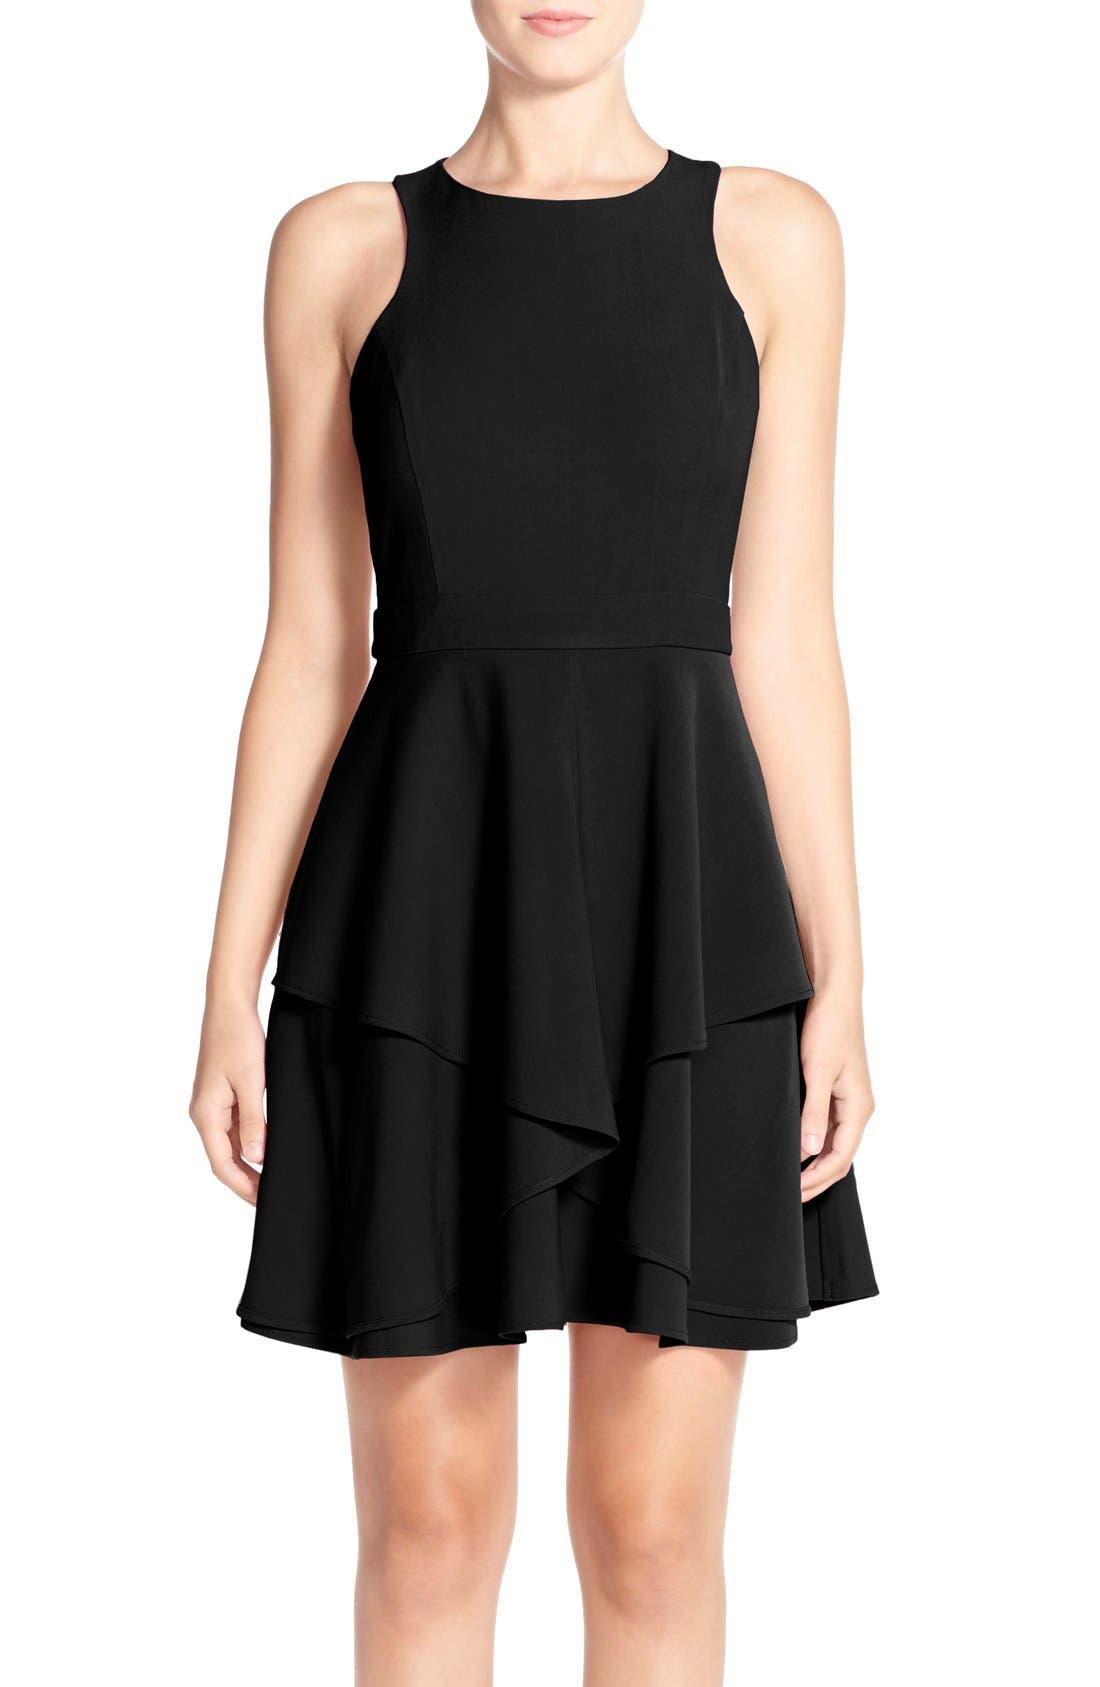 ADELYN RAE, AdelynRae GabardineFit & Flare Dress, Main thumbnail 1, color, 001